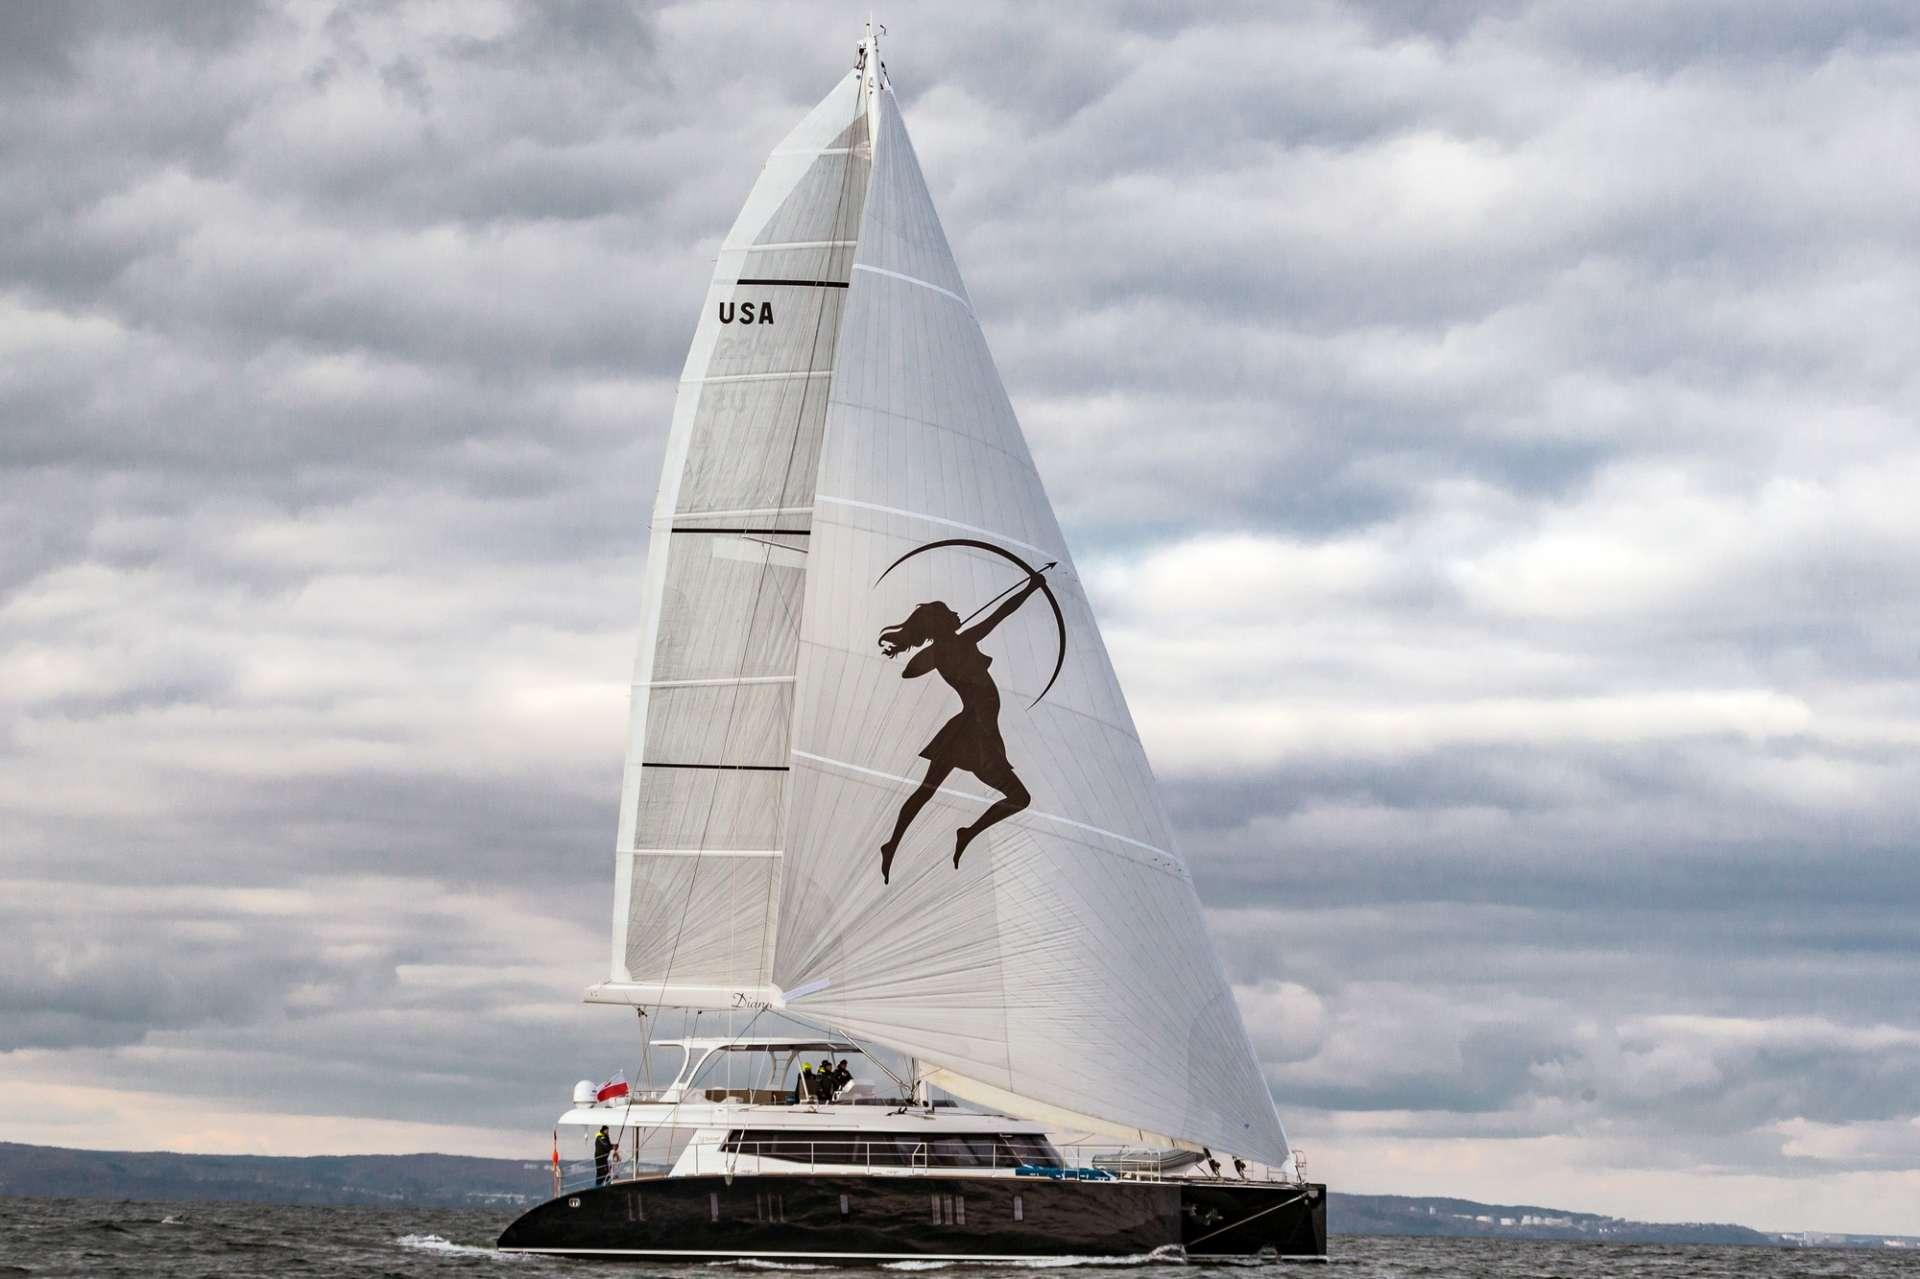 Cat Yacht 'Cat', 8 PAX, 3 Crew, 74.00 Ft, 22.00 Meters, Built 2017, Sunreef Yachts, Refit Year